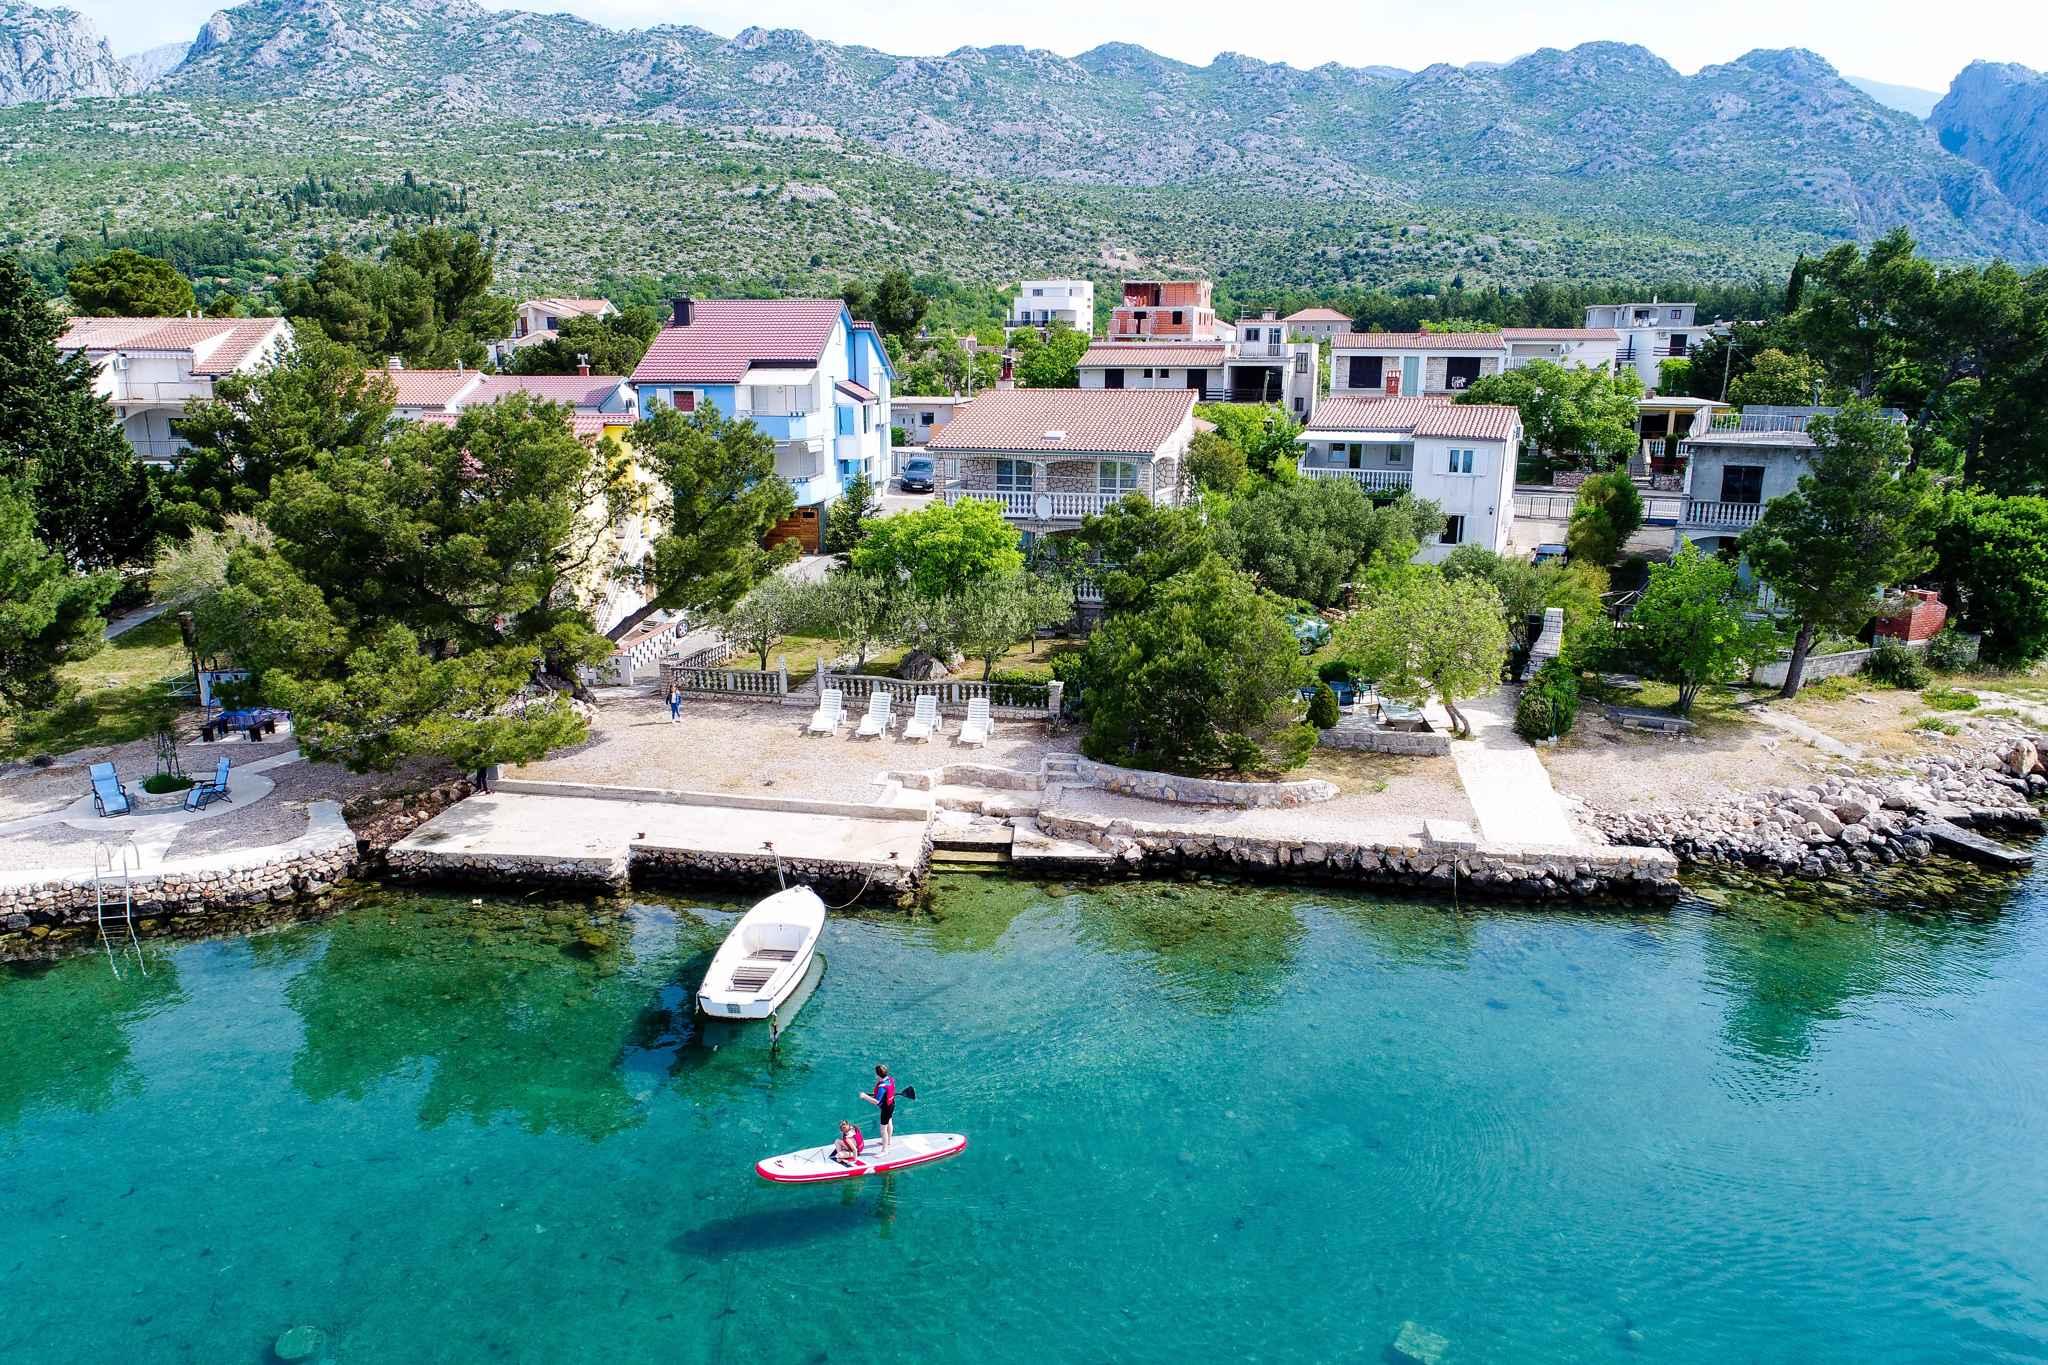 Ferienwohnung mit Panoramameerblick (287921), Starigrad Paklenica, , Dalmatien, Kroatien, Bild 1